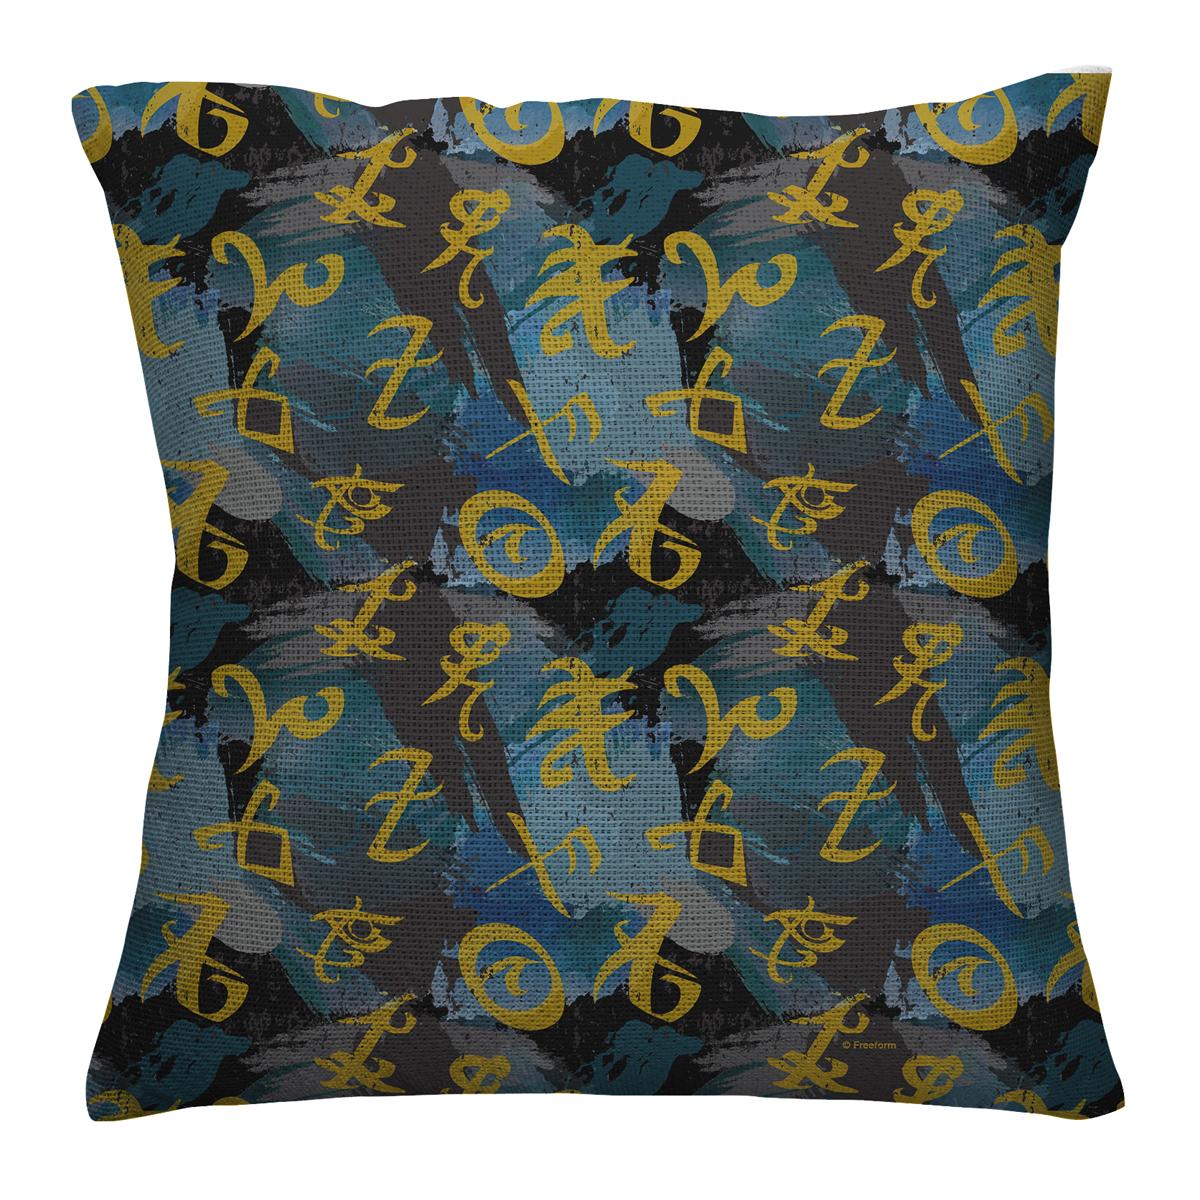 Shadowhunters Runes Allover Throw Pillow (16x16)